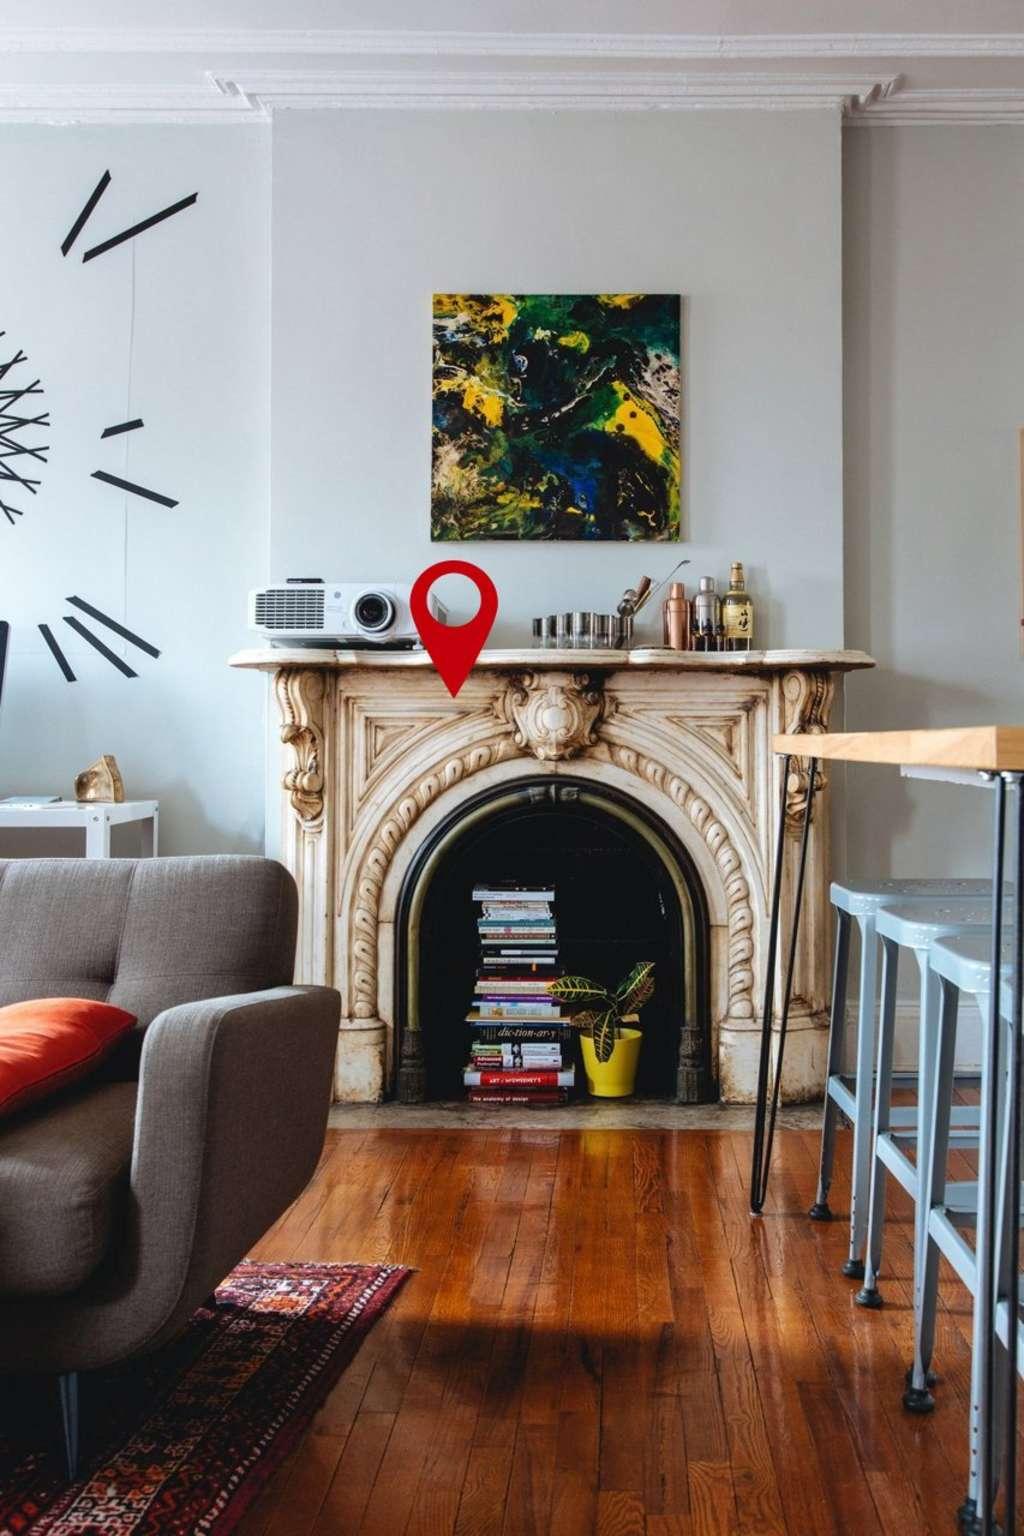 Living Room Geometry: The Basics of a Well-Balanced Room